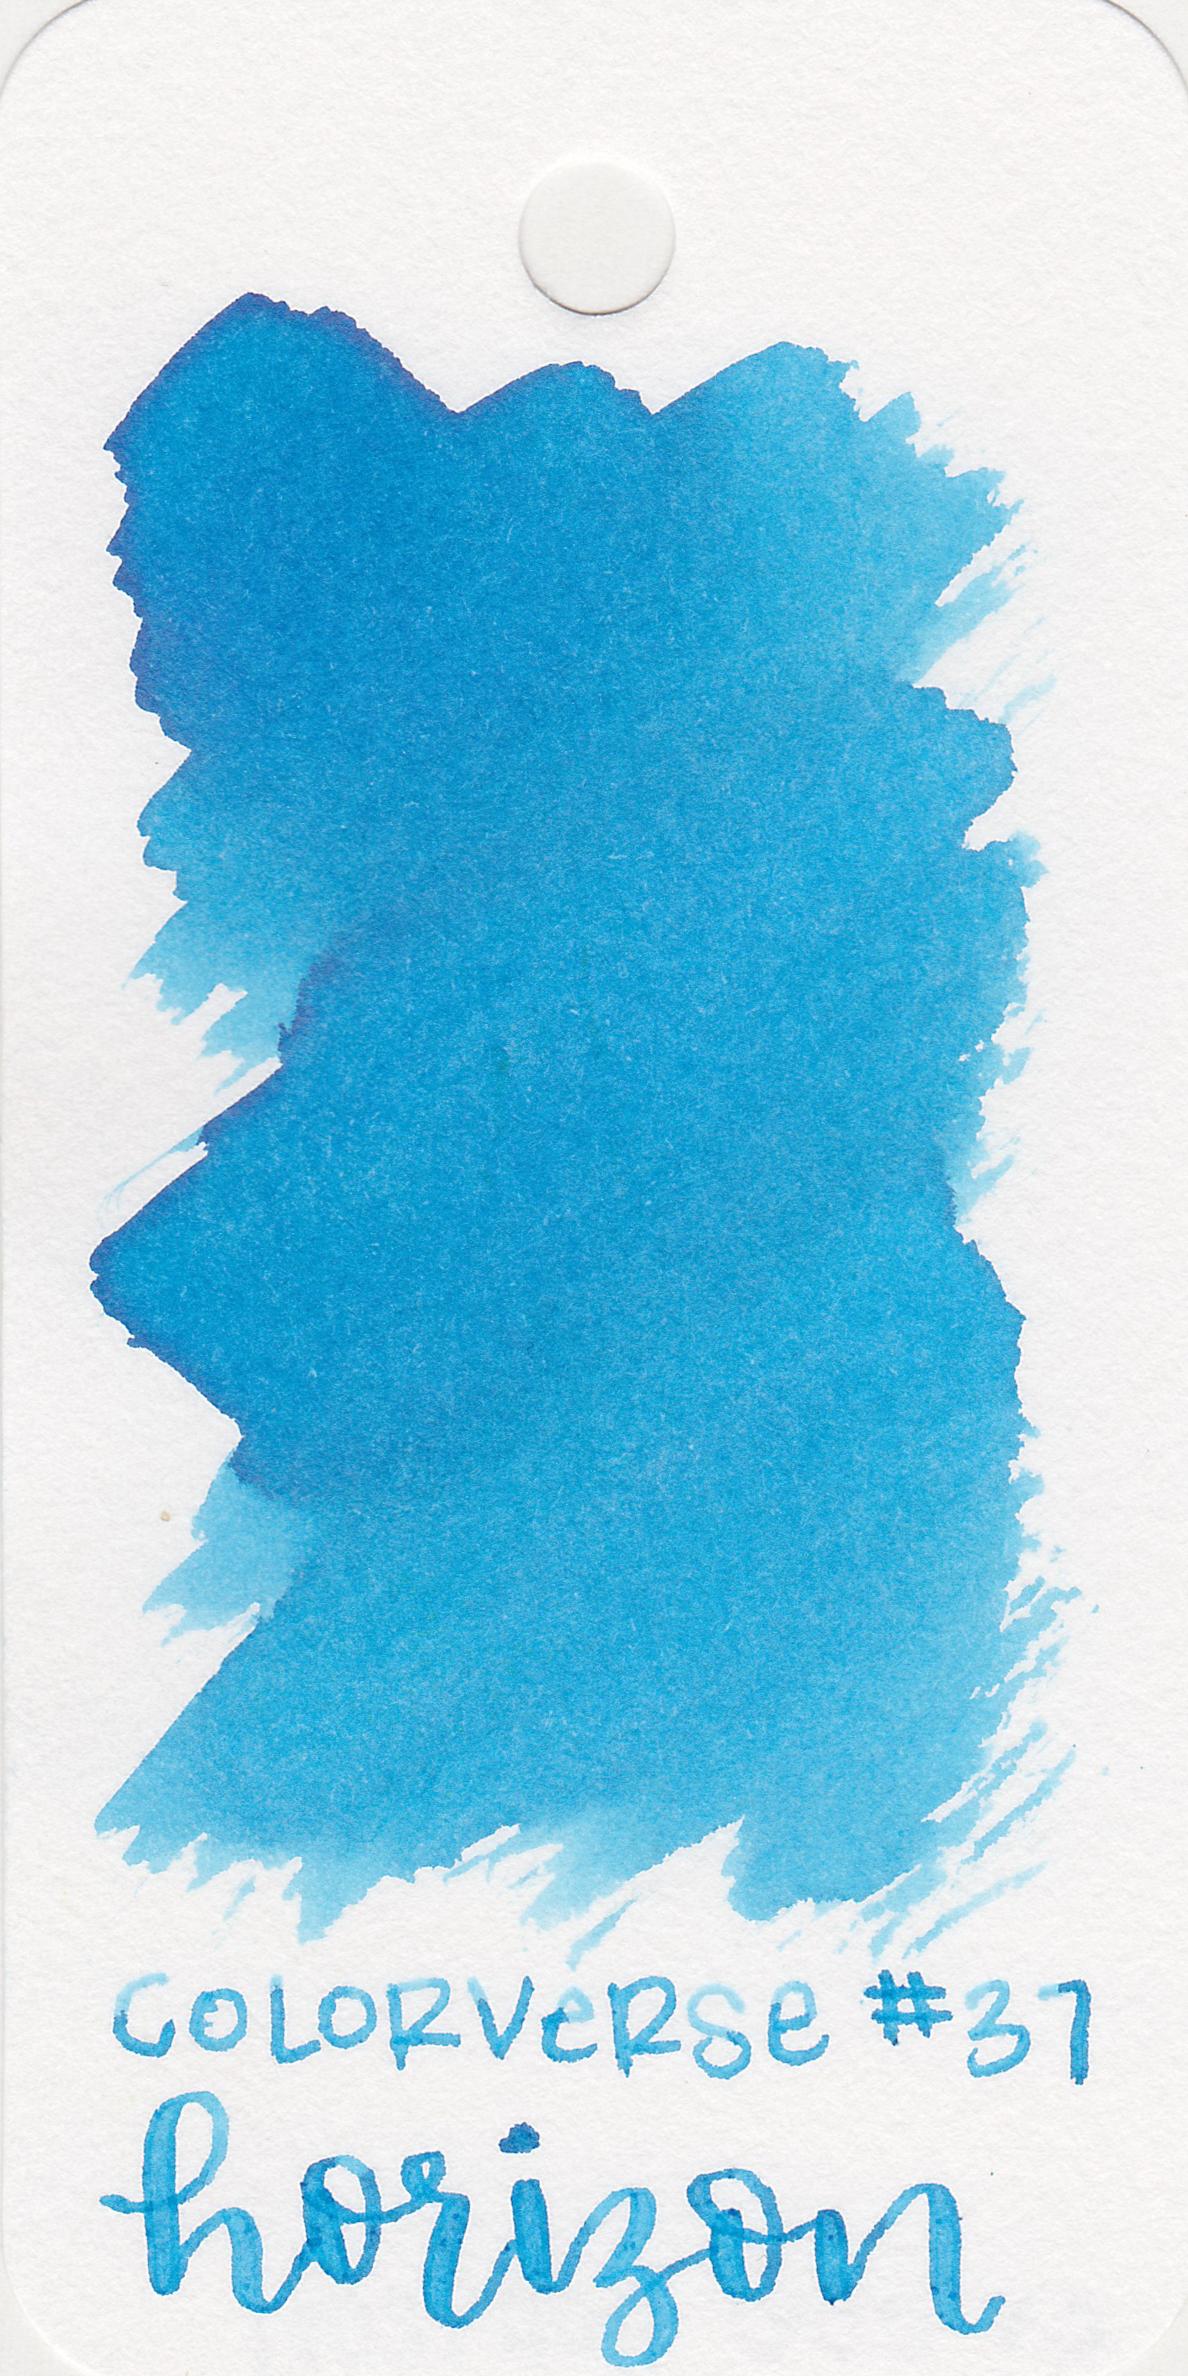 The color: - Horizon is a pretty,light sky blue.